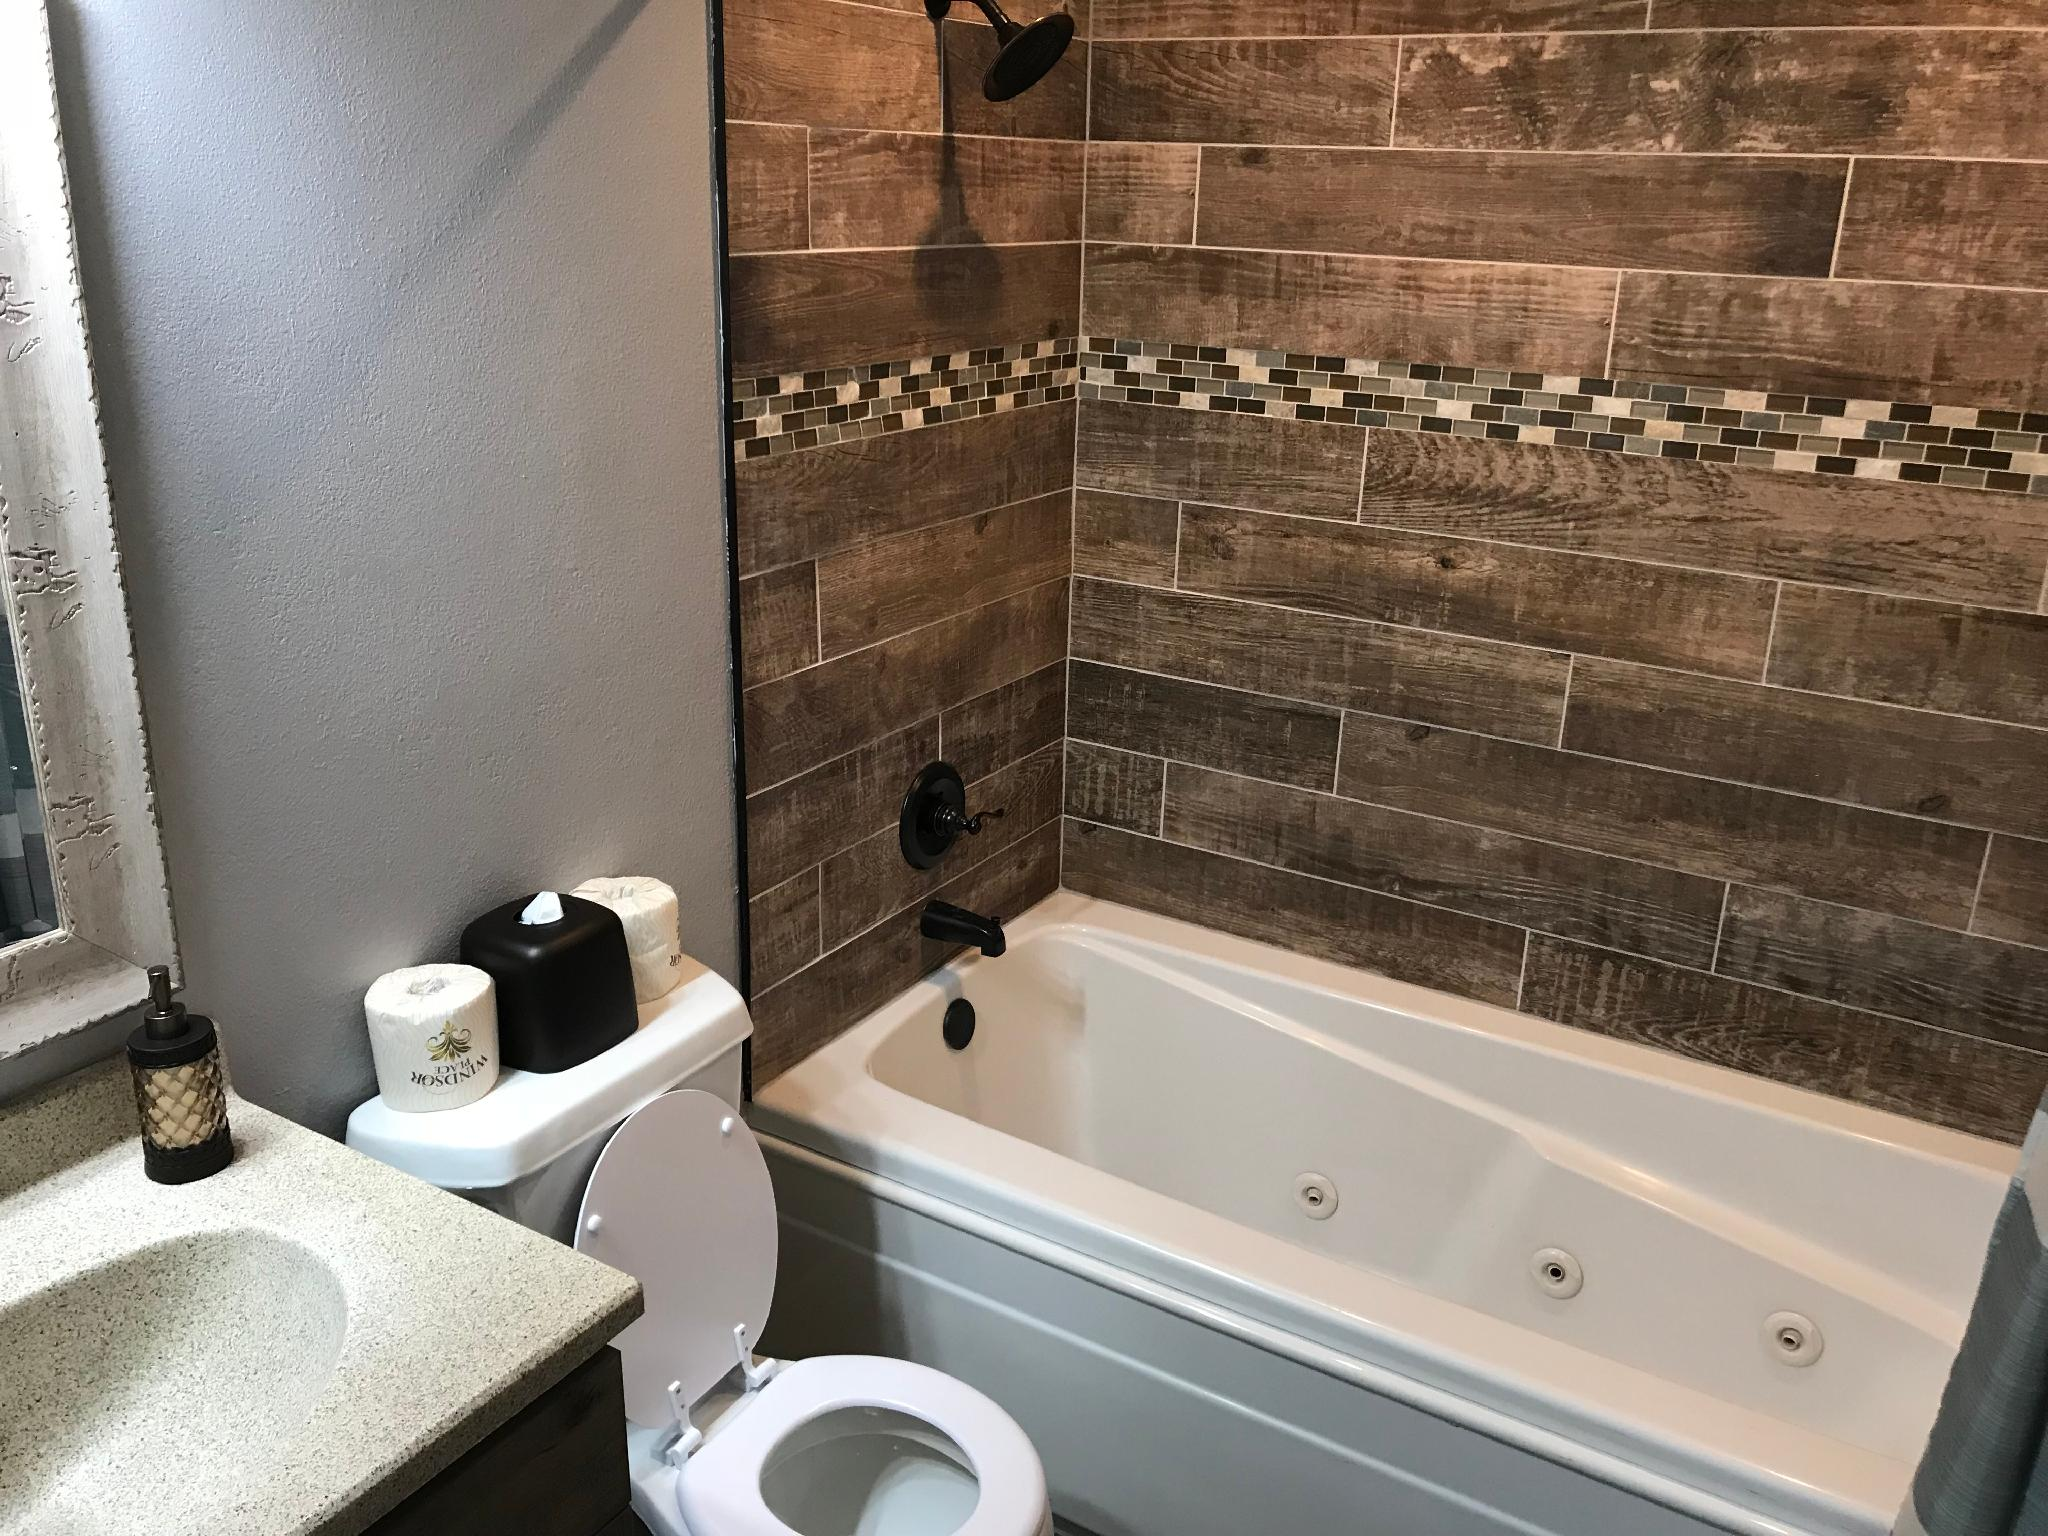 2 Bedroom Penthouse Condo, Near the Strip, 1000 Hills Golf View: Sleeps 8 : Club A-12